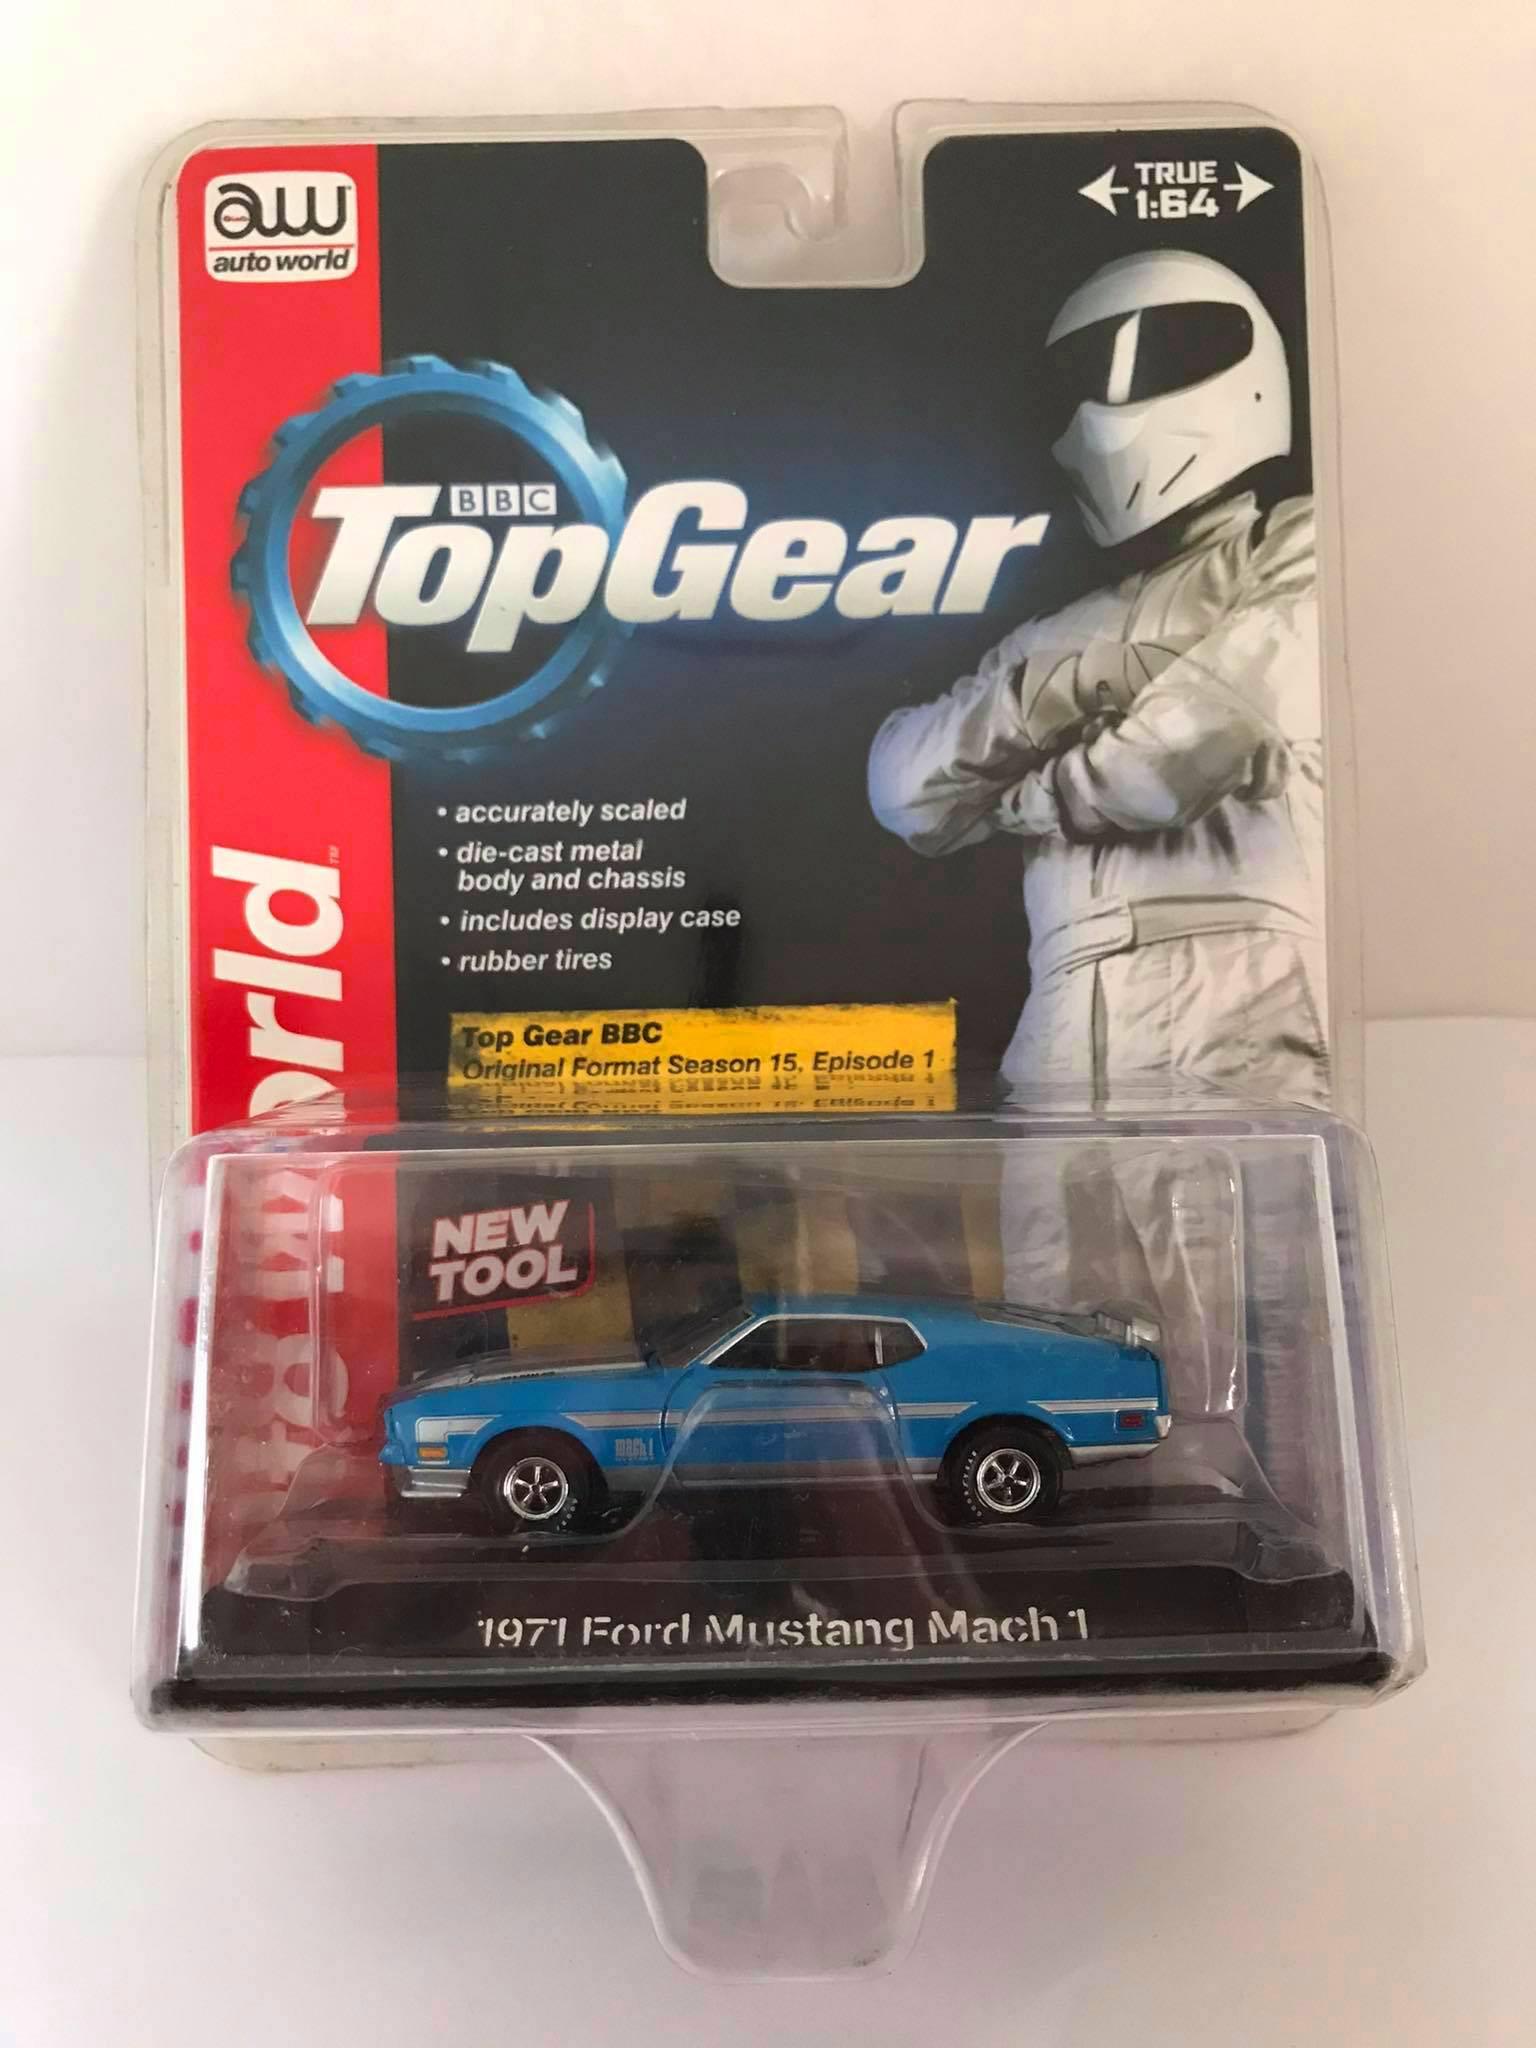 Auto World - 1971 Ford Mustang Mach 1 Azul - BBC Top Gear